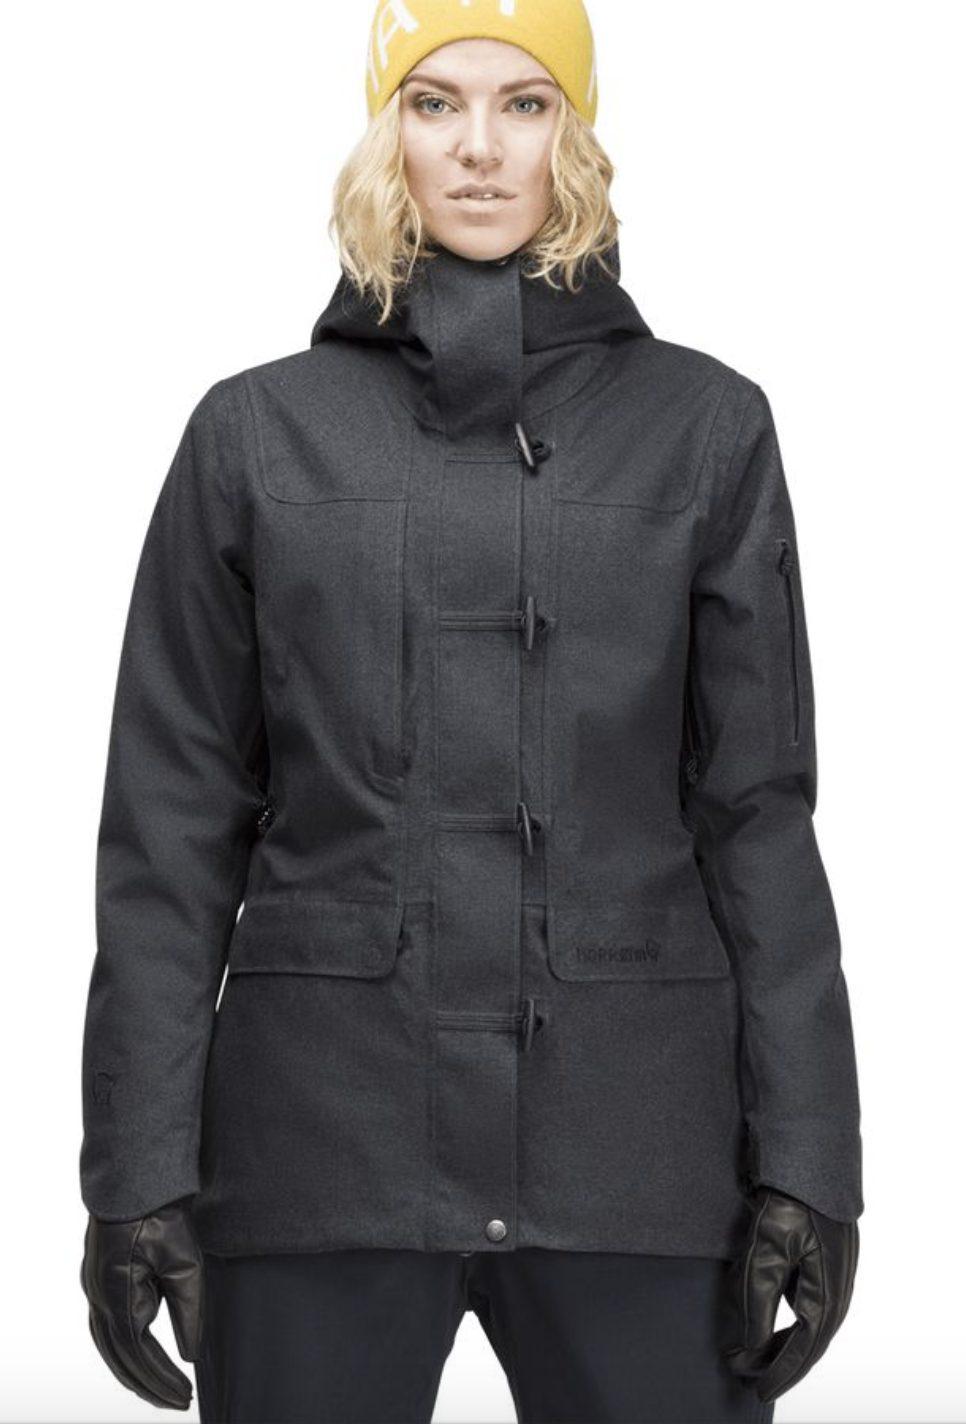 Luxury ski coat for women by Norrona